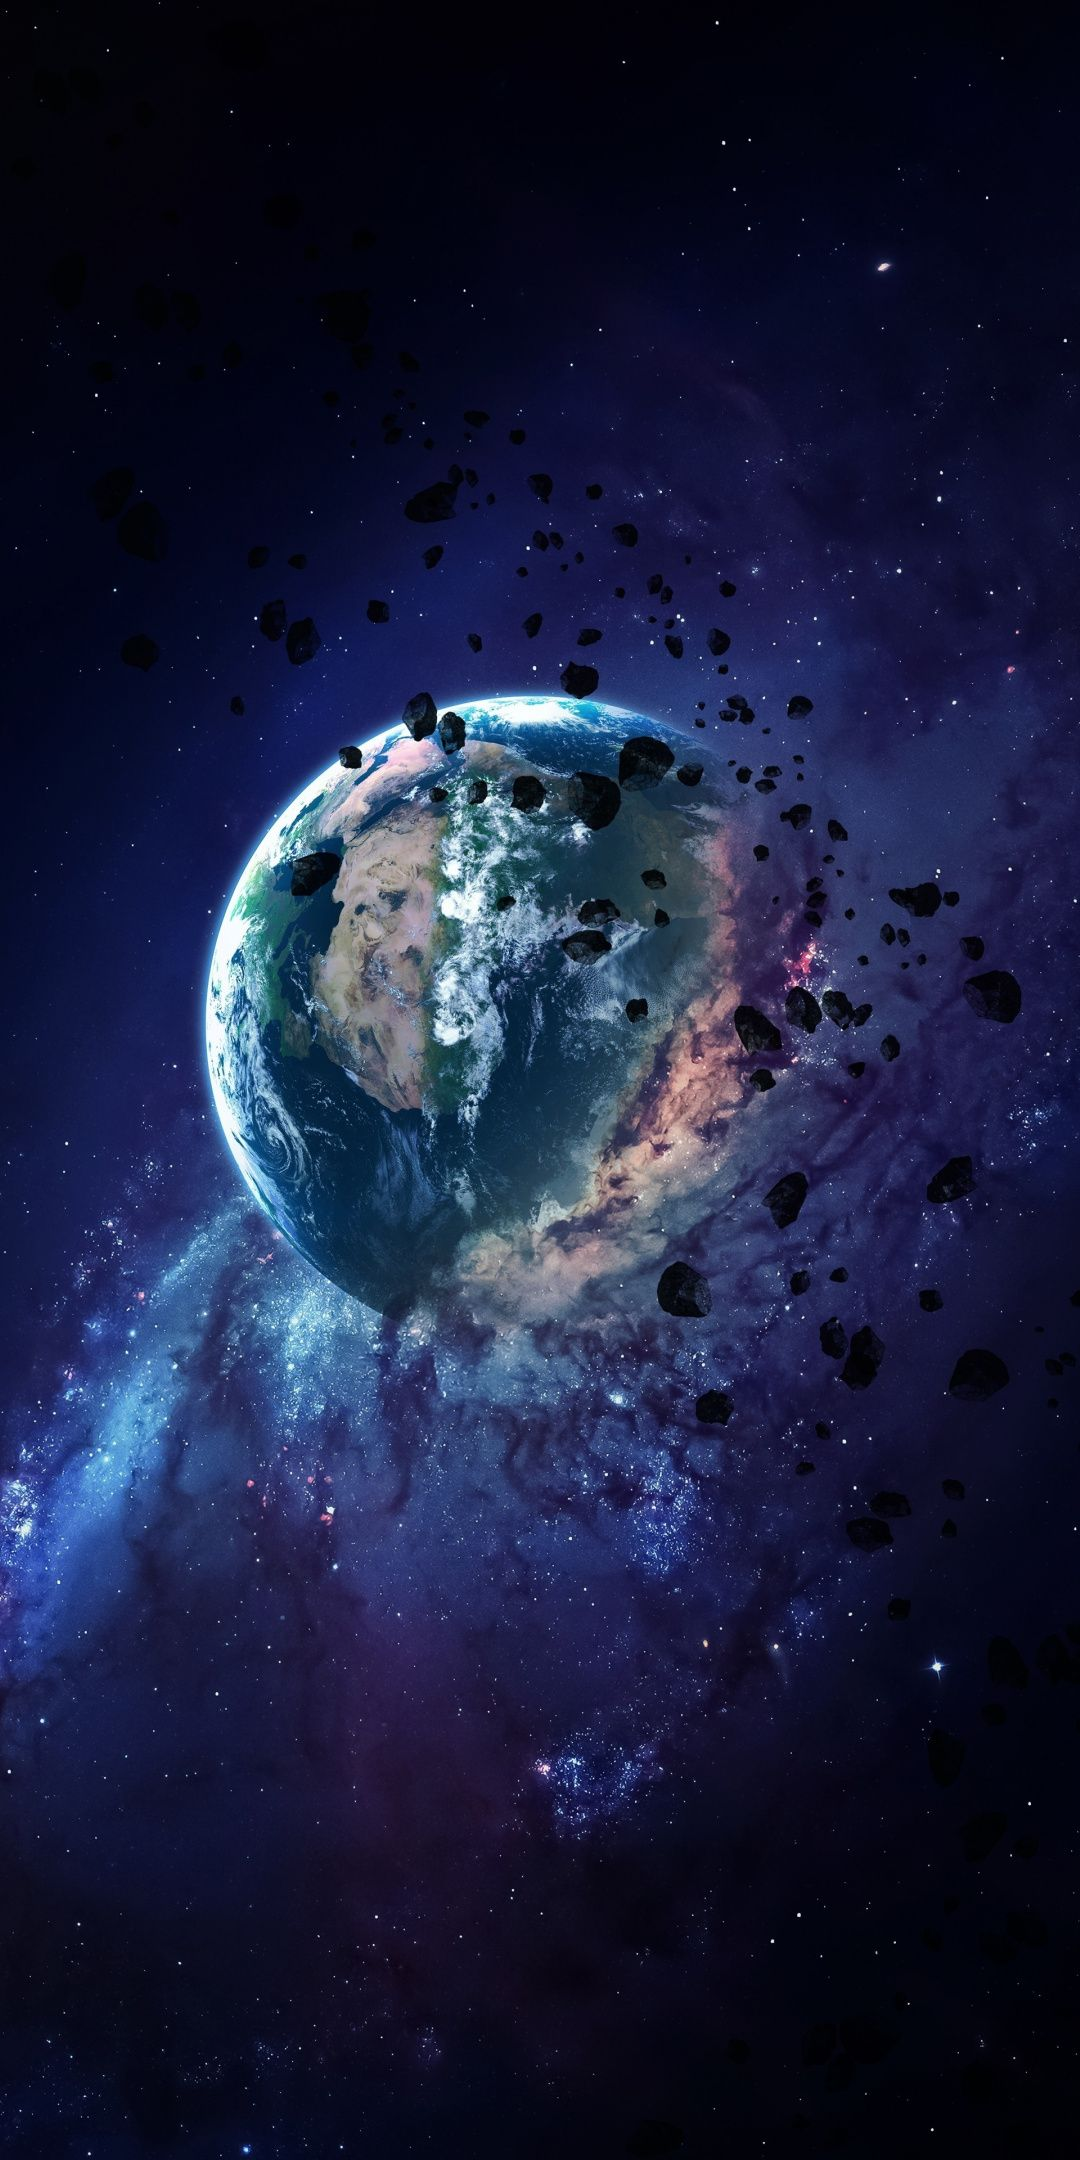 Apocalyptic Earth Space Art 1080x2160 Wallpaper Earth Art Solar System Wallpaper Iphone Wallpaper